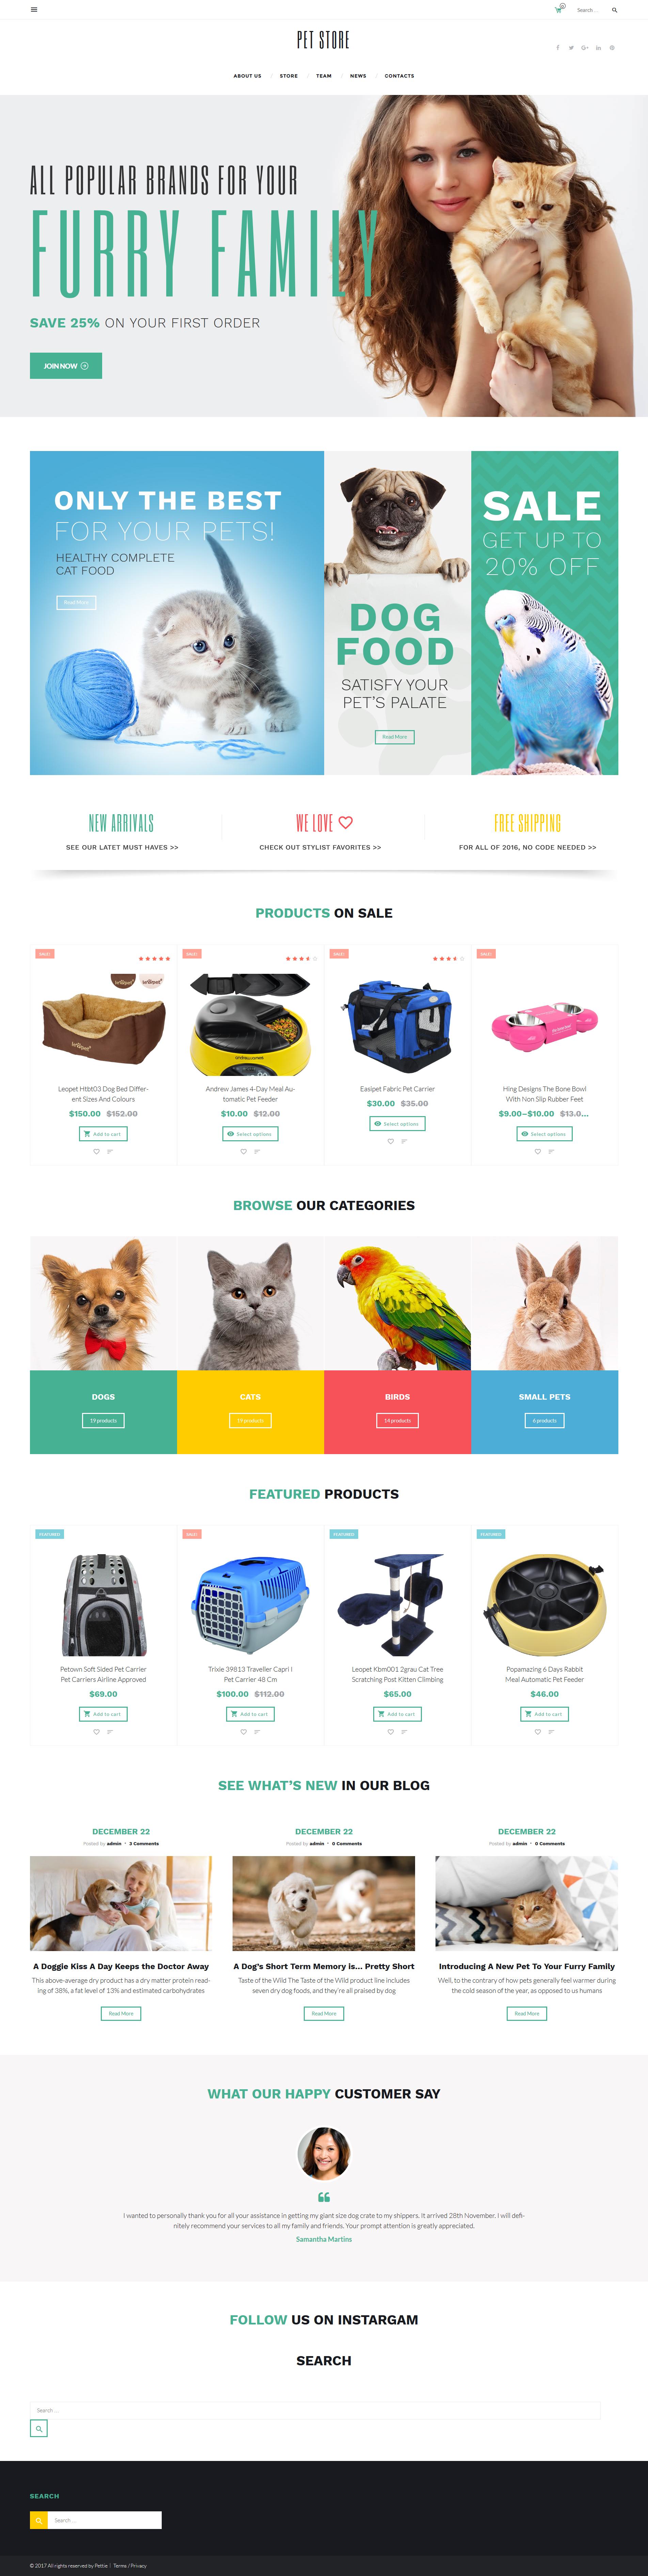 """PetStore - Pets Supplies Shop Responsive WooCommerce Theme"" 响应式WooCommerce模板 #58660 - 截图"